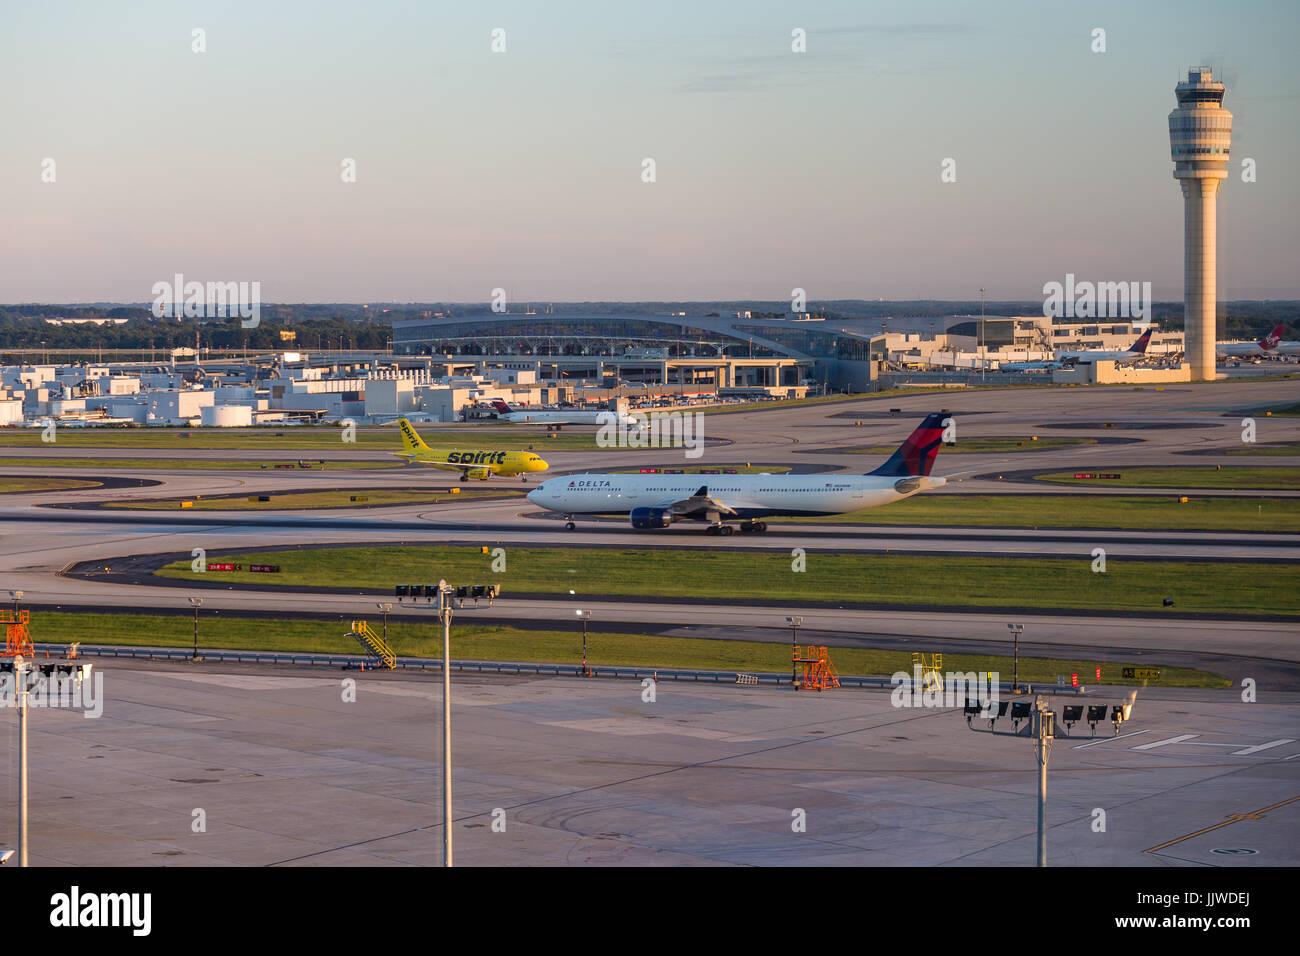 Delta and Spirit  in Atlanta Hartsfield Jackson Airport - Stock Image